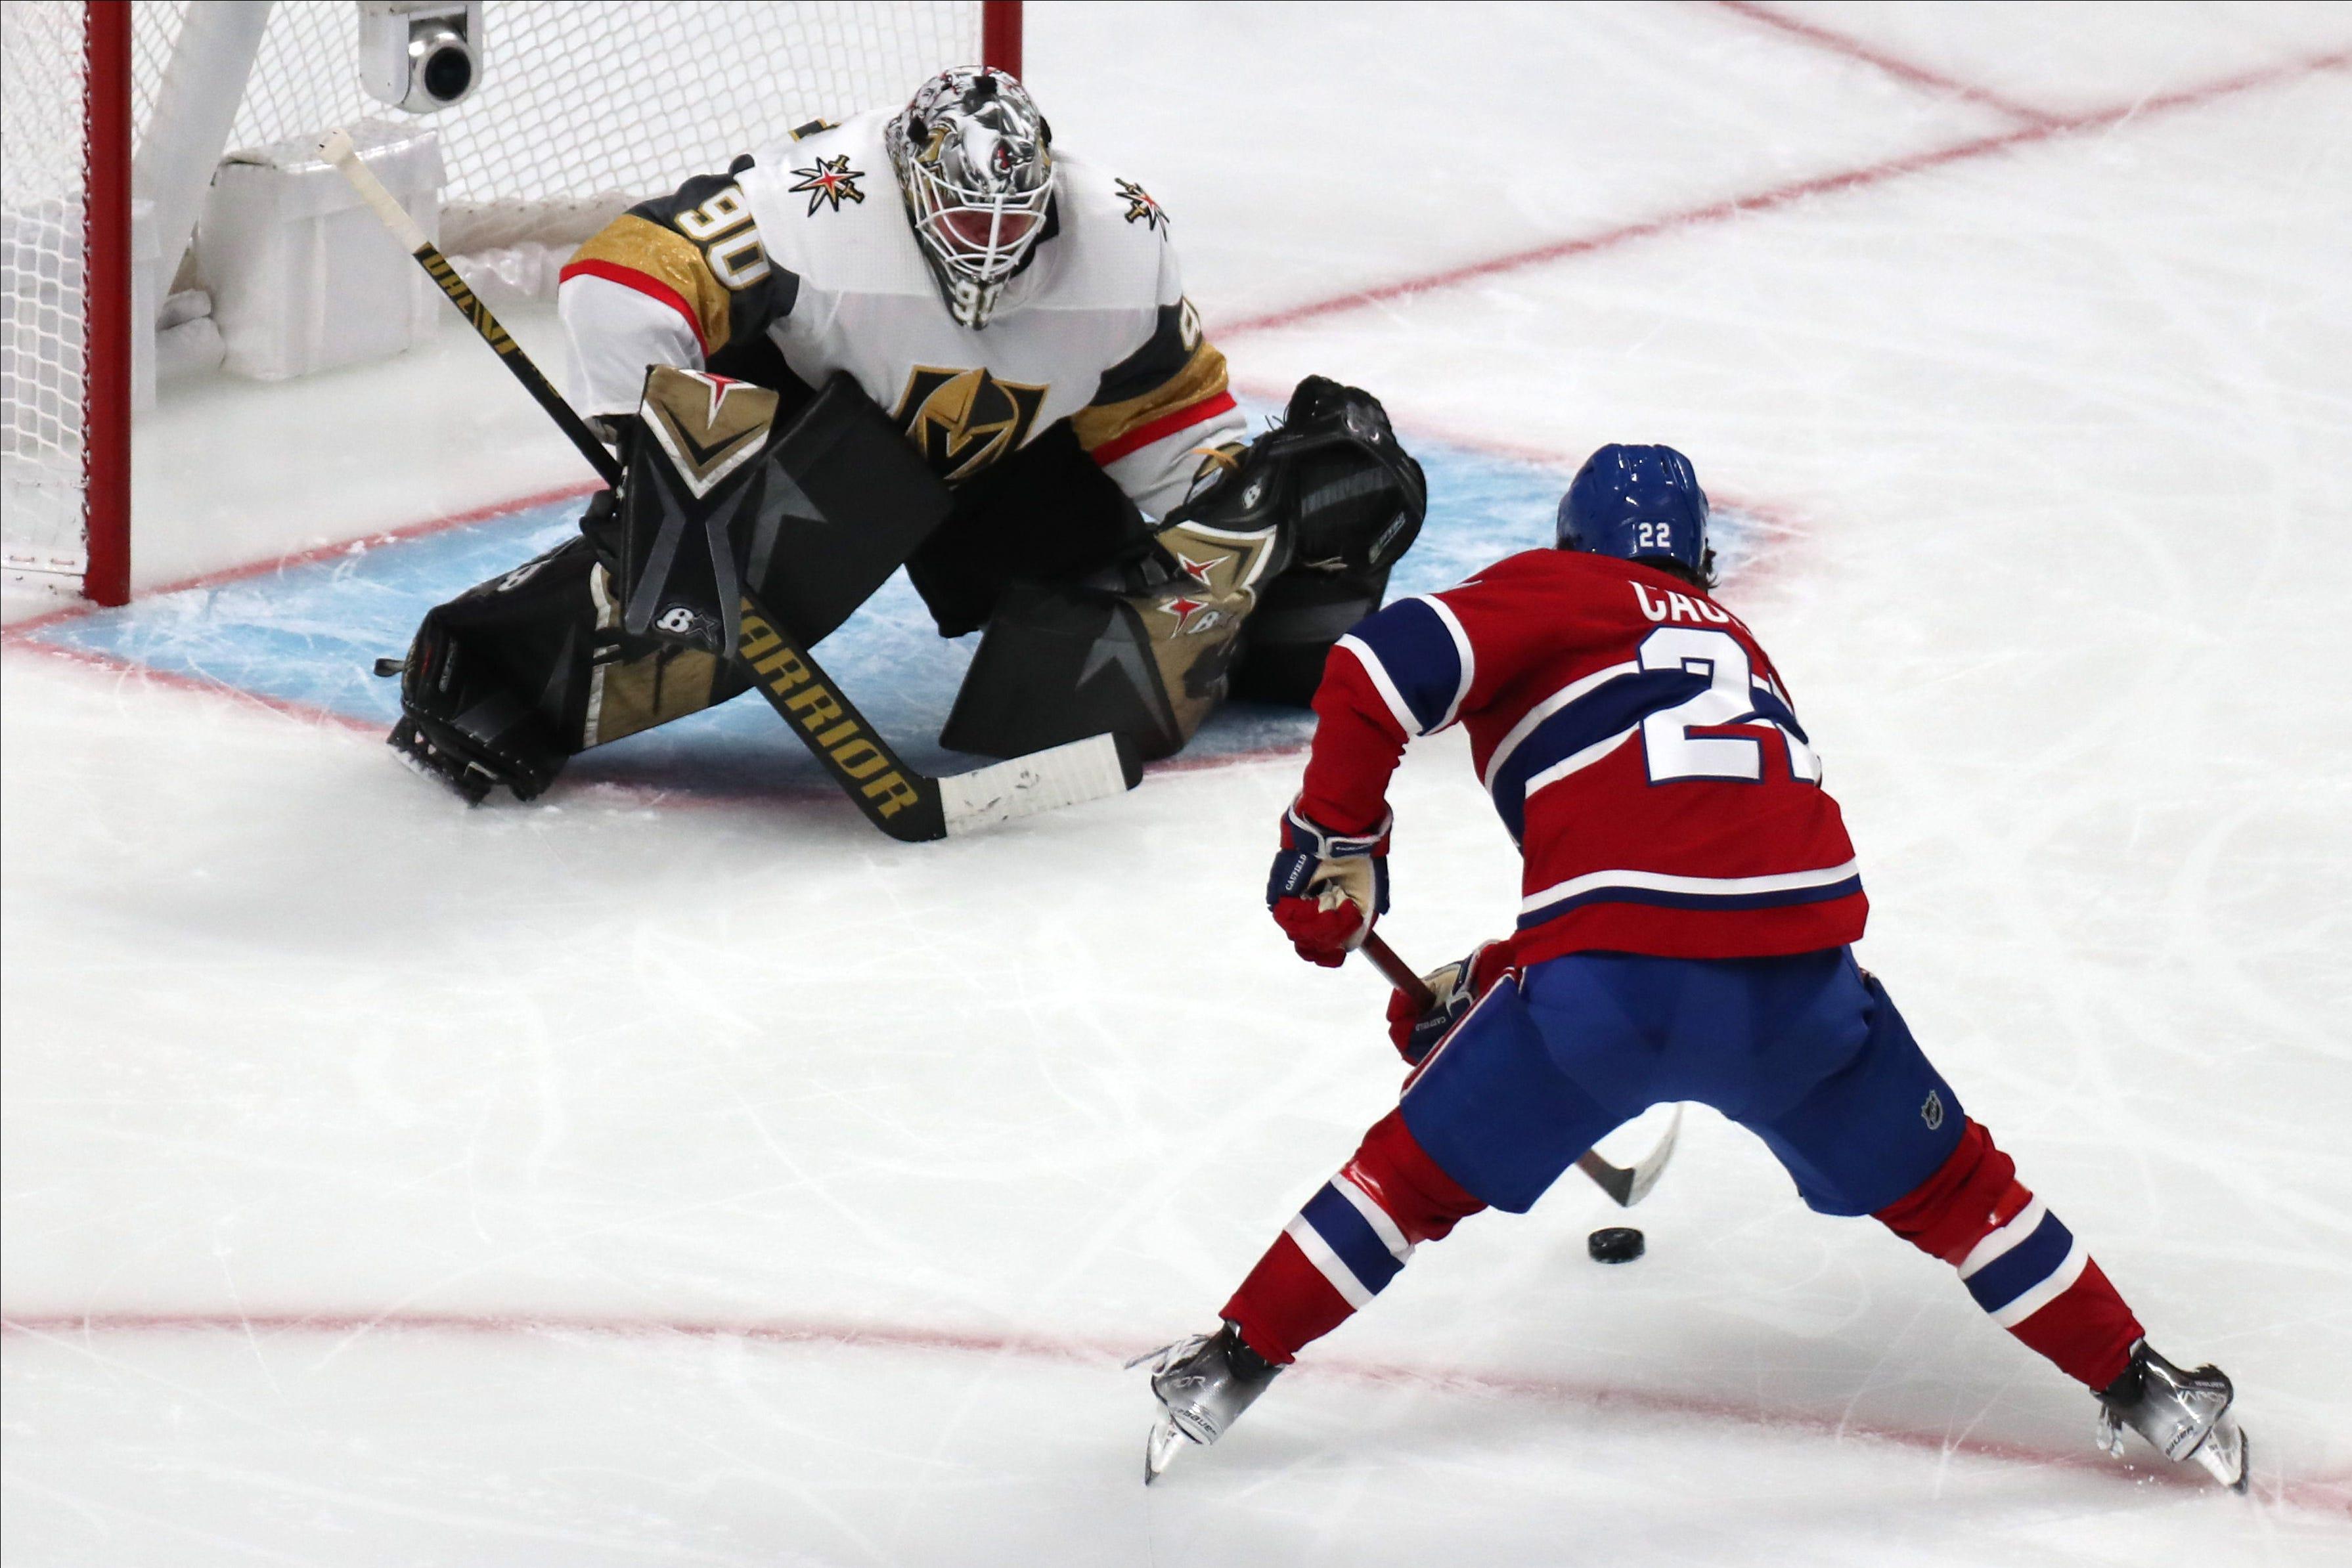 Goalie Robin Lehner gets start, helps Vegas Golden Knights beat Montreal Canadiens to tie series